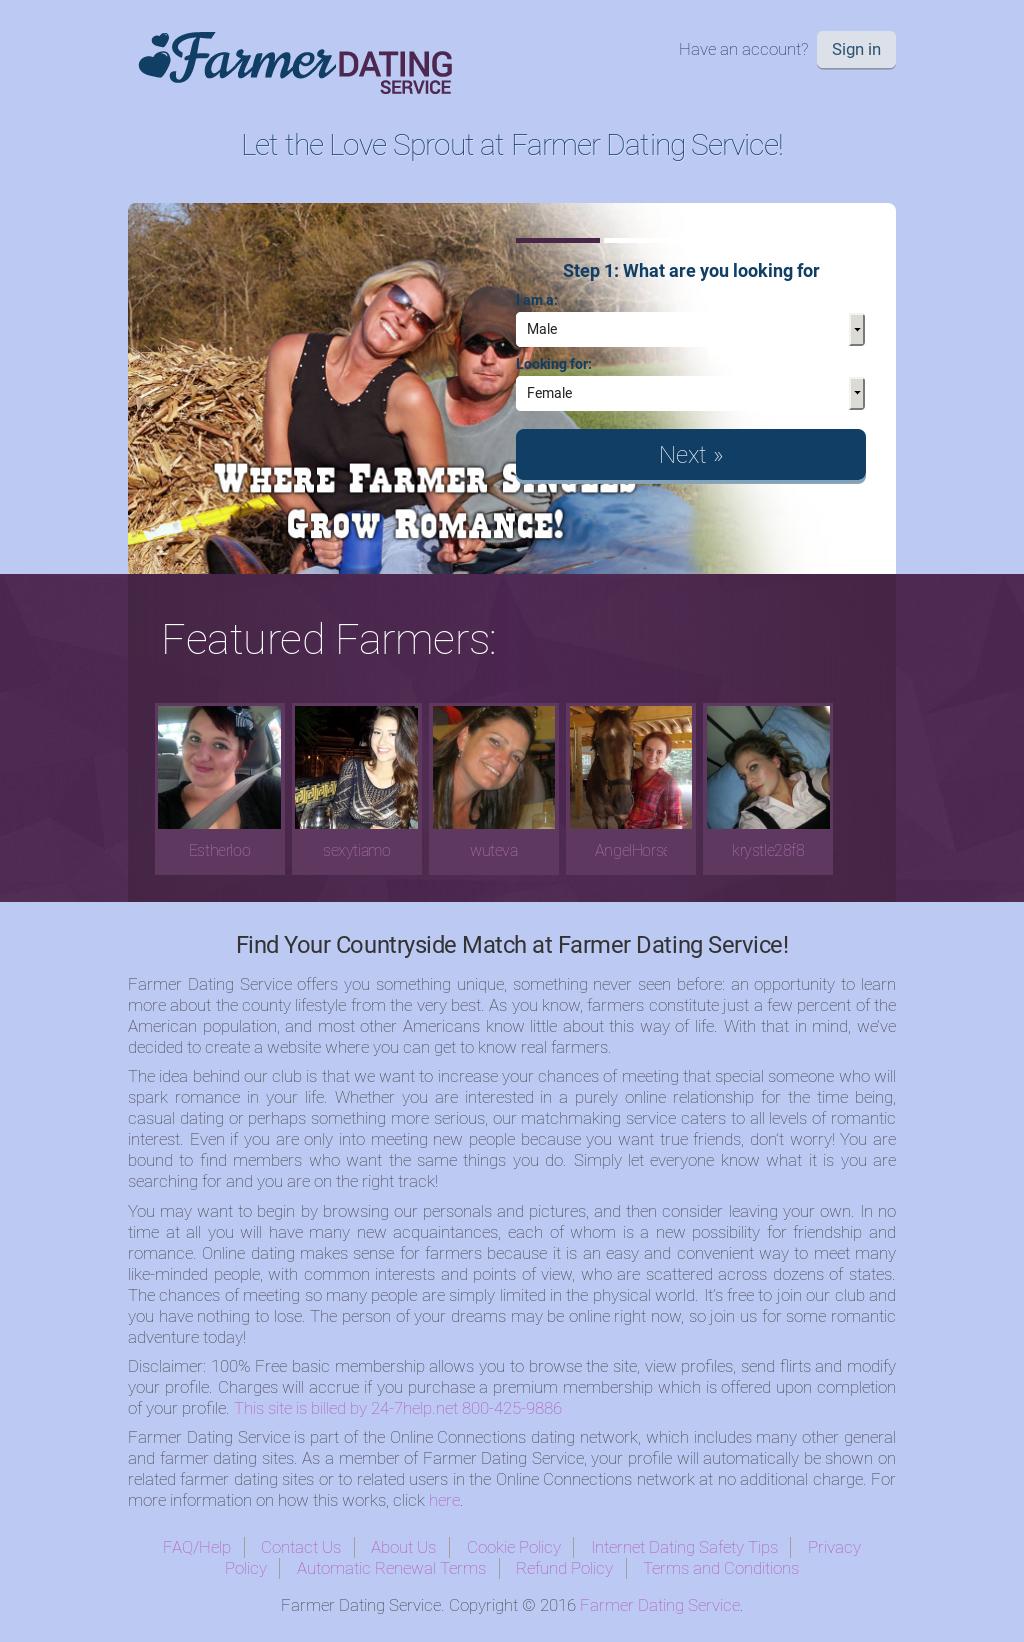 farmers.com online dating modderige poten dating